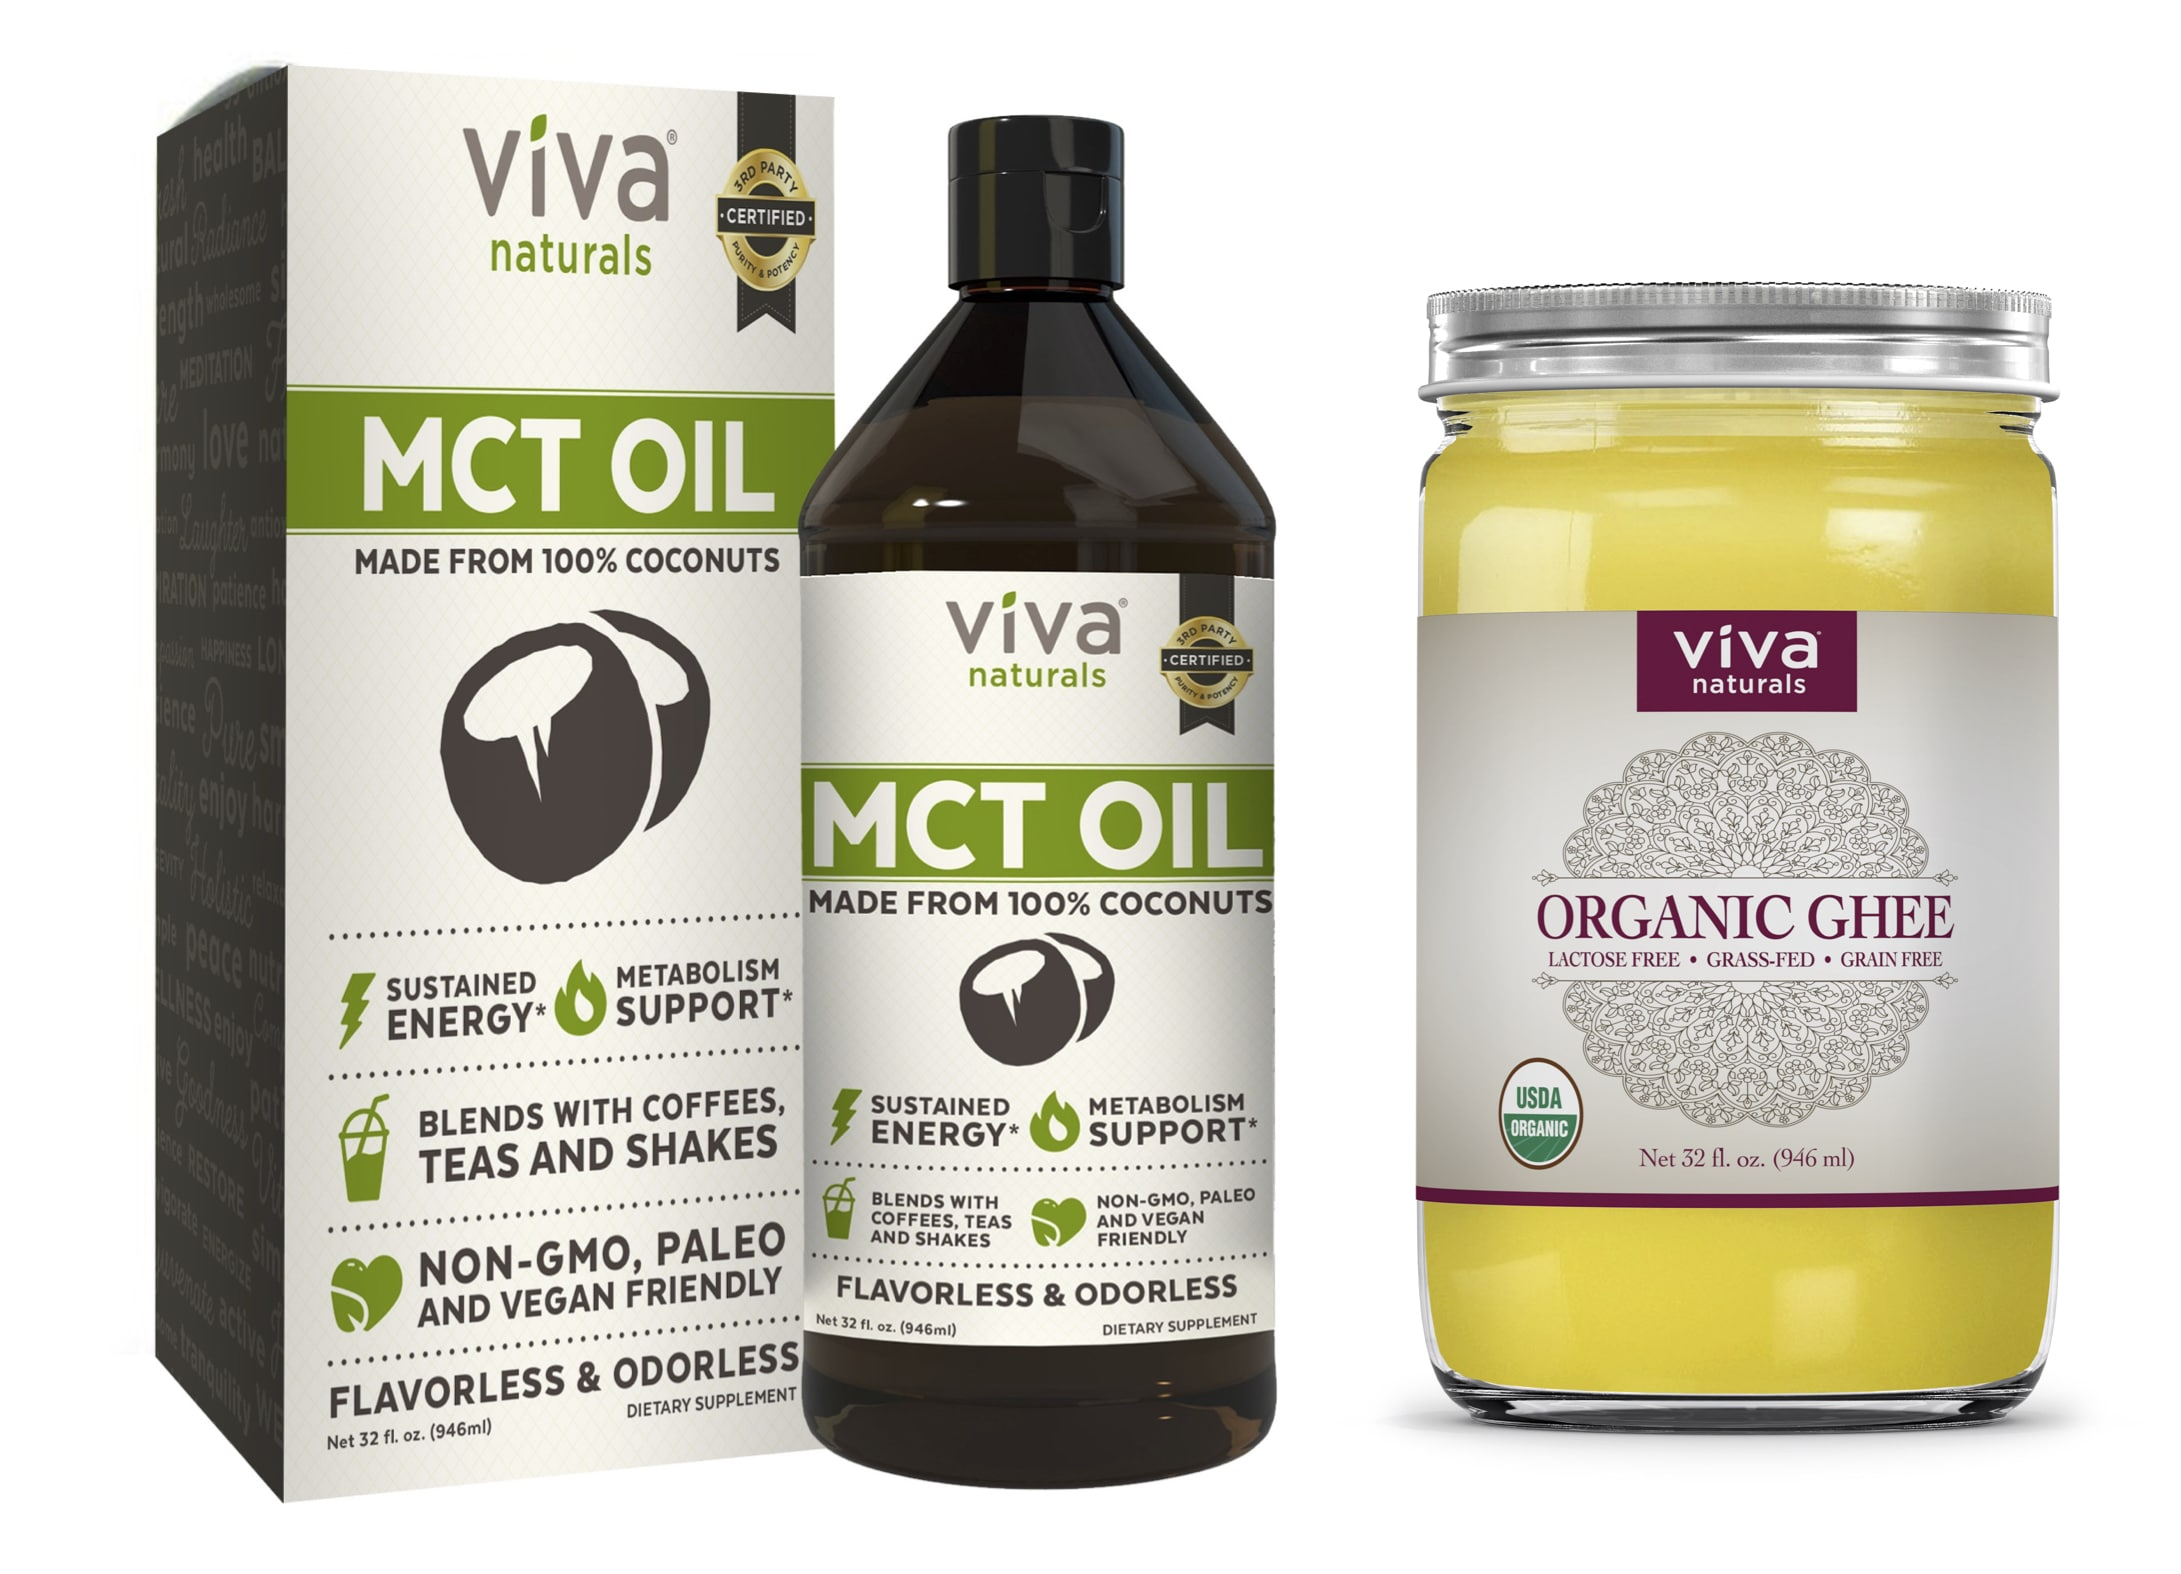 Viva naturals mct oil and organic ghee paleo foundation viva naturals mct oil and ghee xflitez Choice Image